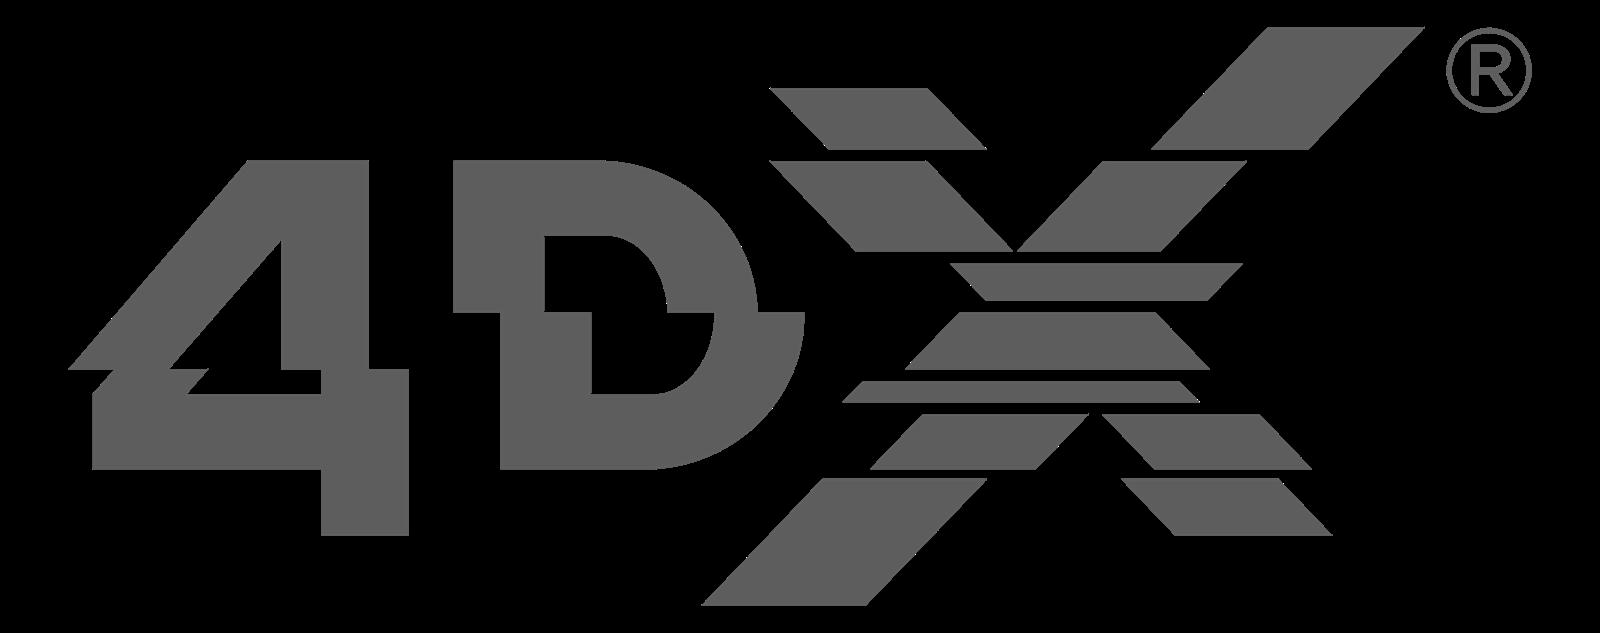 www kina xxx sex video com